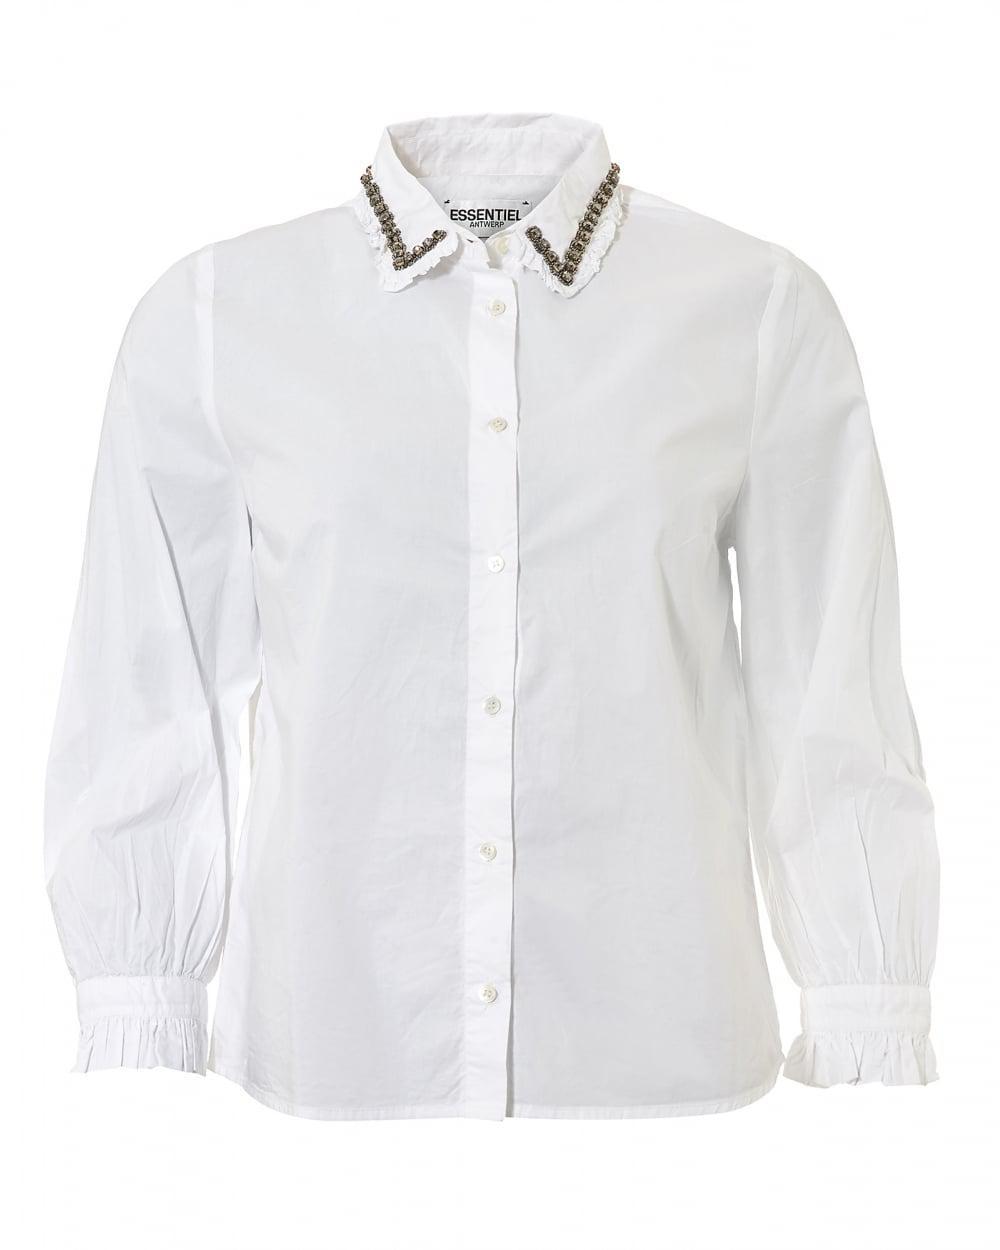 Lyst essentiel antwerp odakota5 jewelled collar pin tuck for White shirt with collar pin